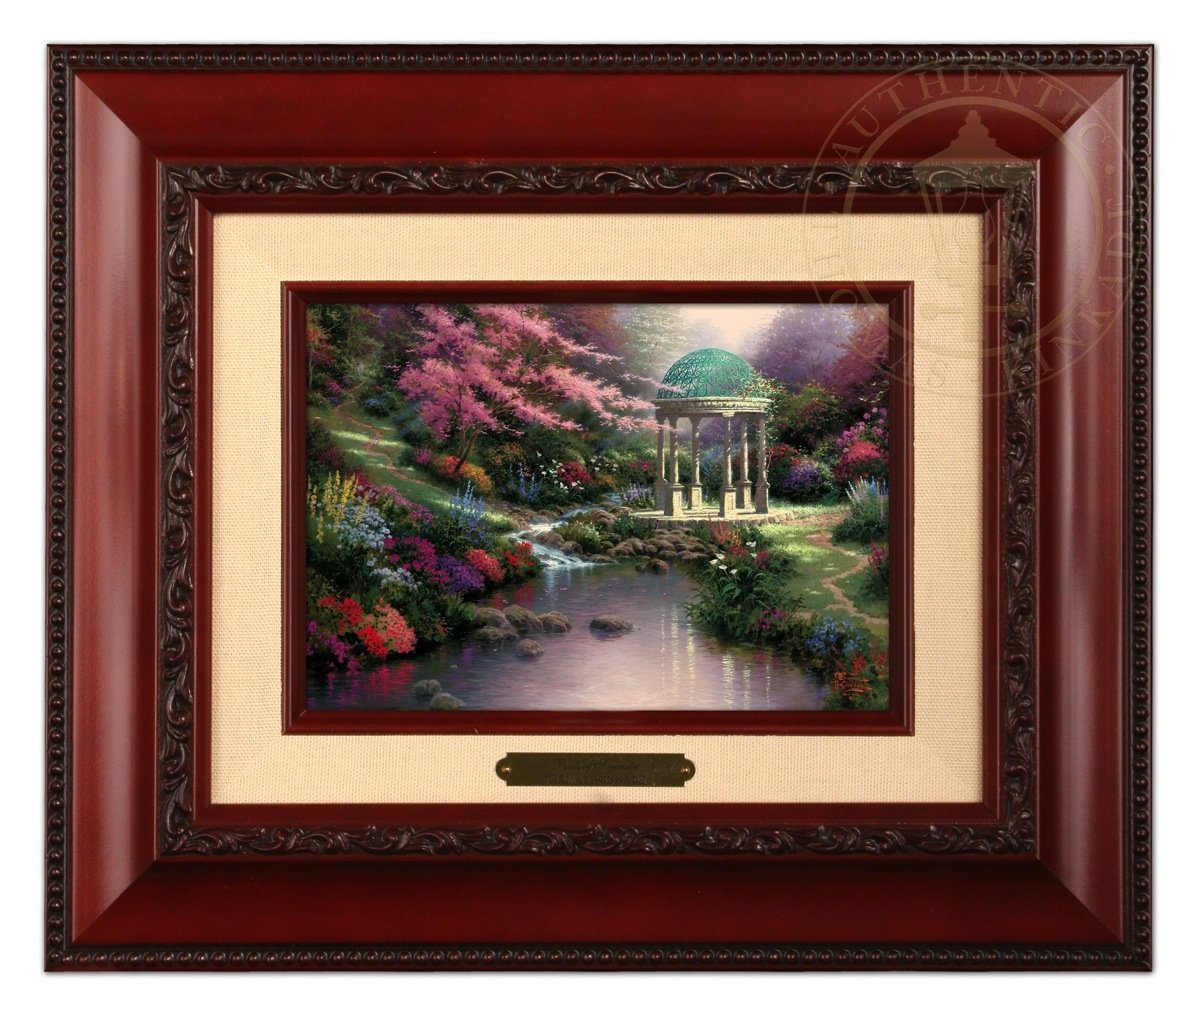 Thomas Kinkade Pools of Serenity Brushwork (Brandy Frame)